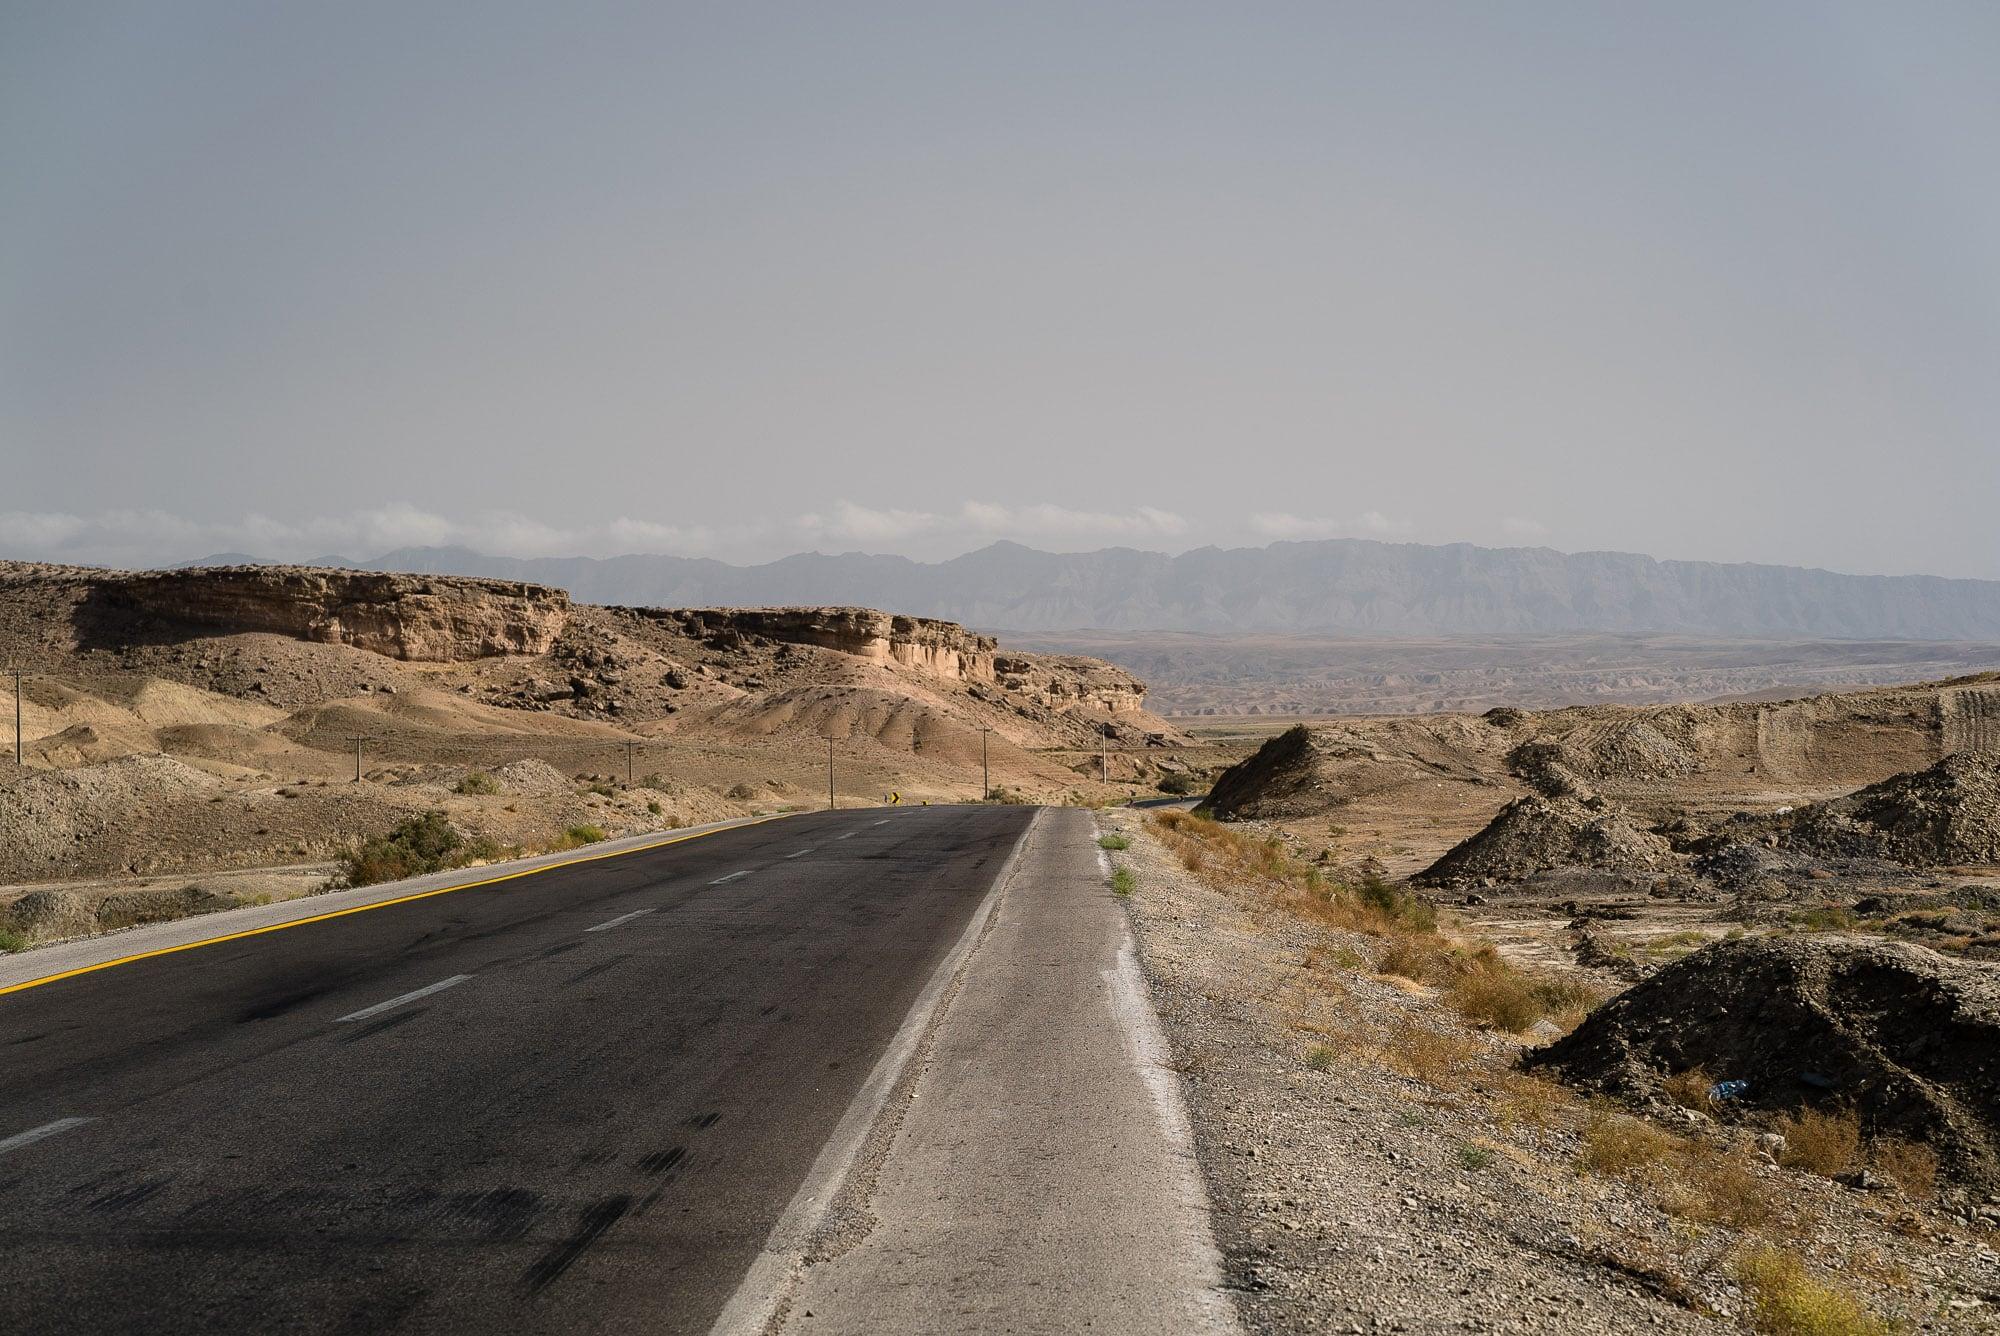 road towards Mashhad